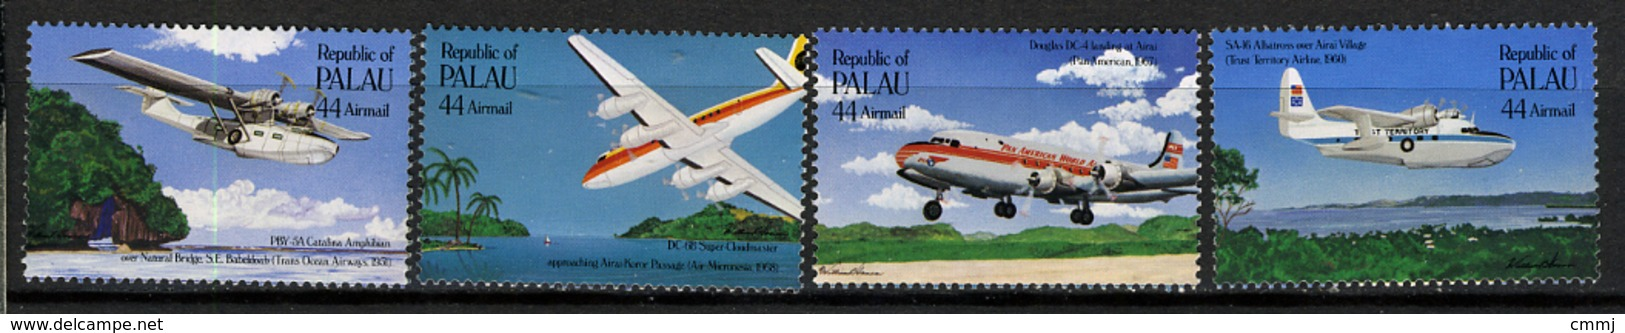 1985 - PALAU -  Catg.. Mi. 92/95 -  NH - (I-SRA3207.33) - Palau